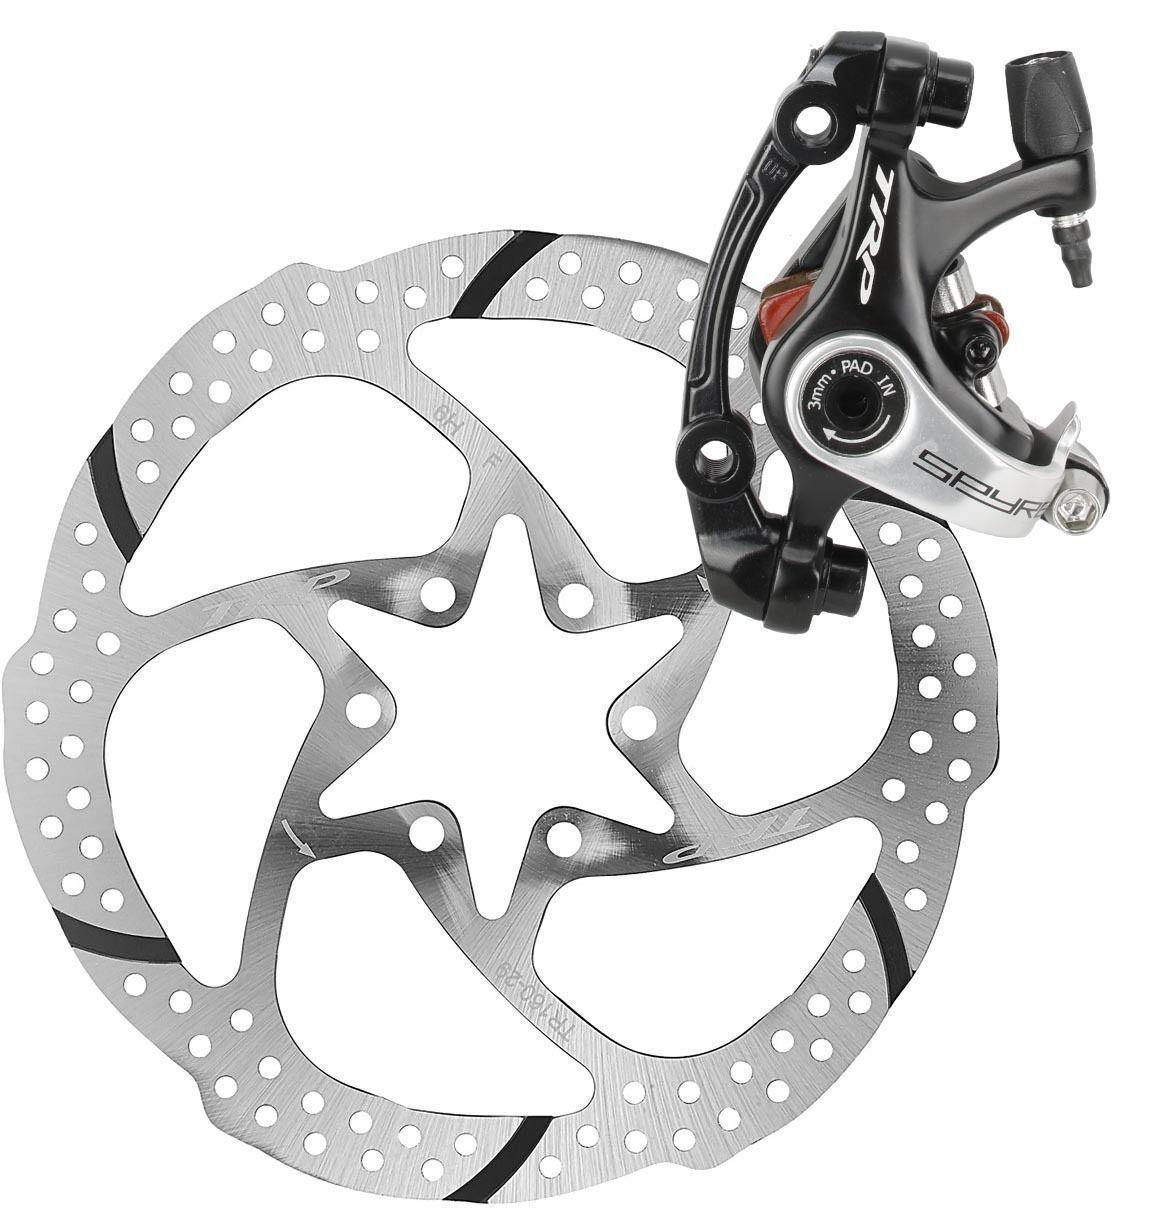 TRP SPYRE Road Bike Alloy Mechancial Disc Brake Caliper redor